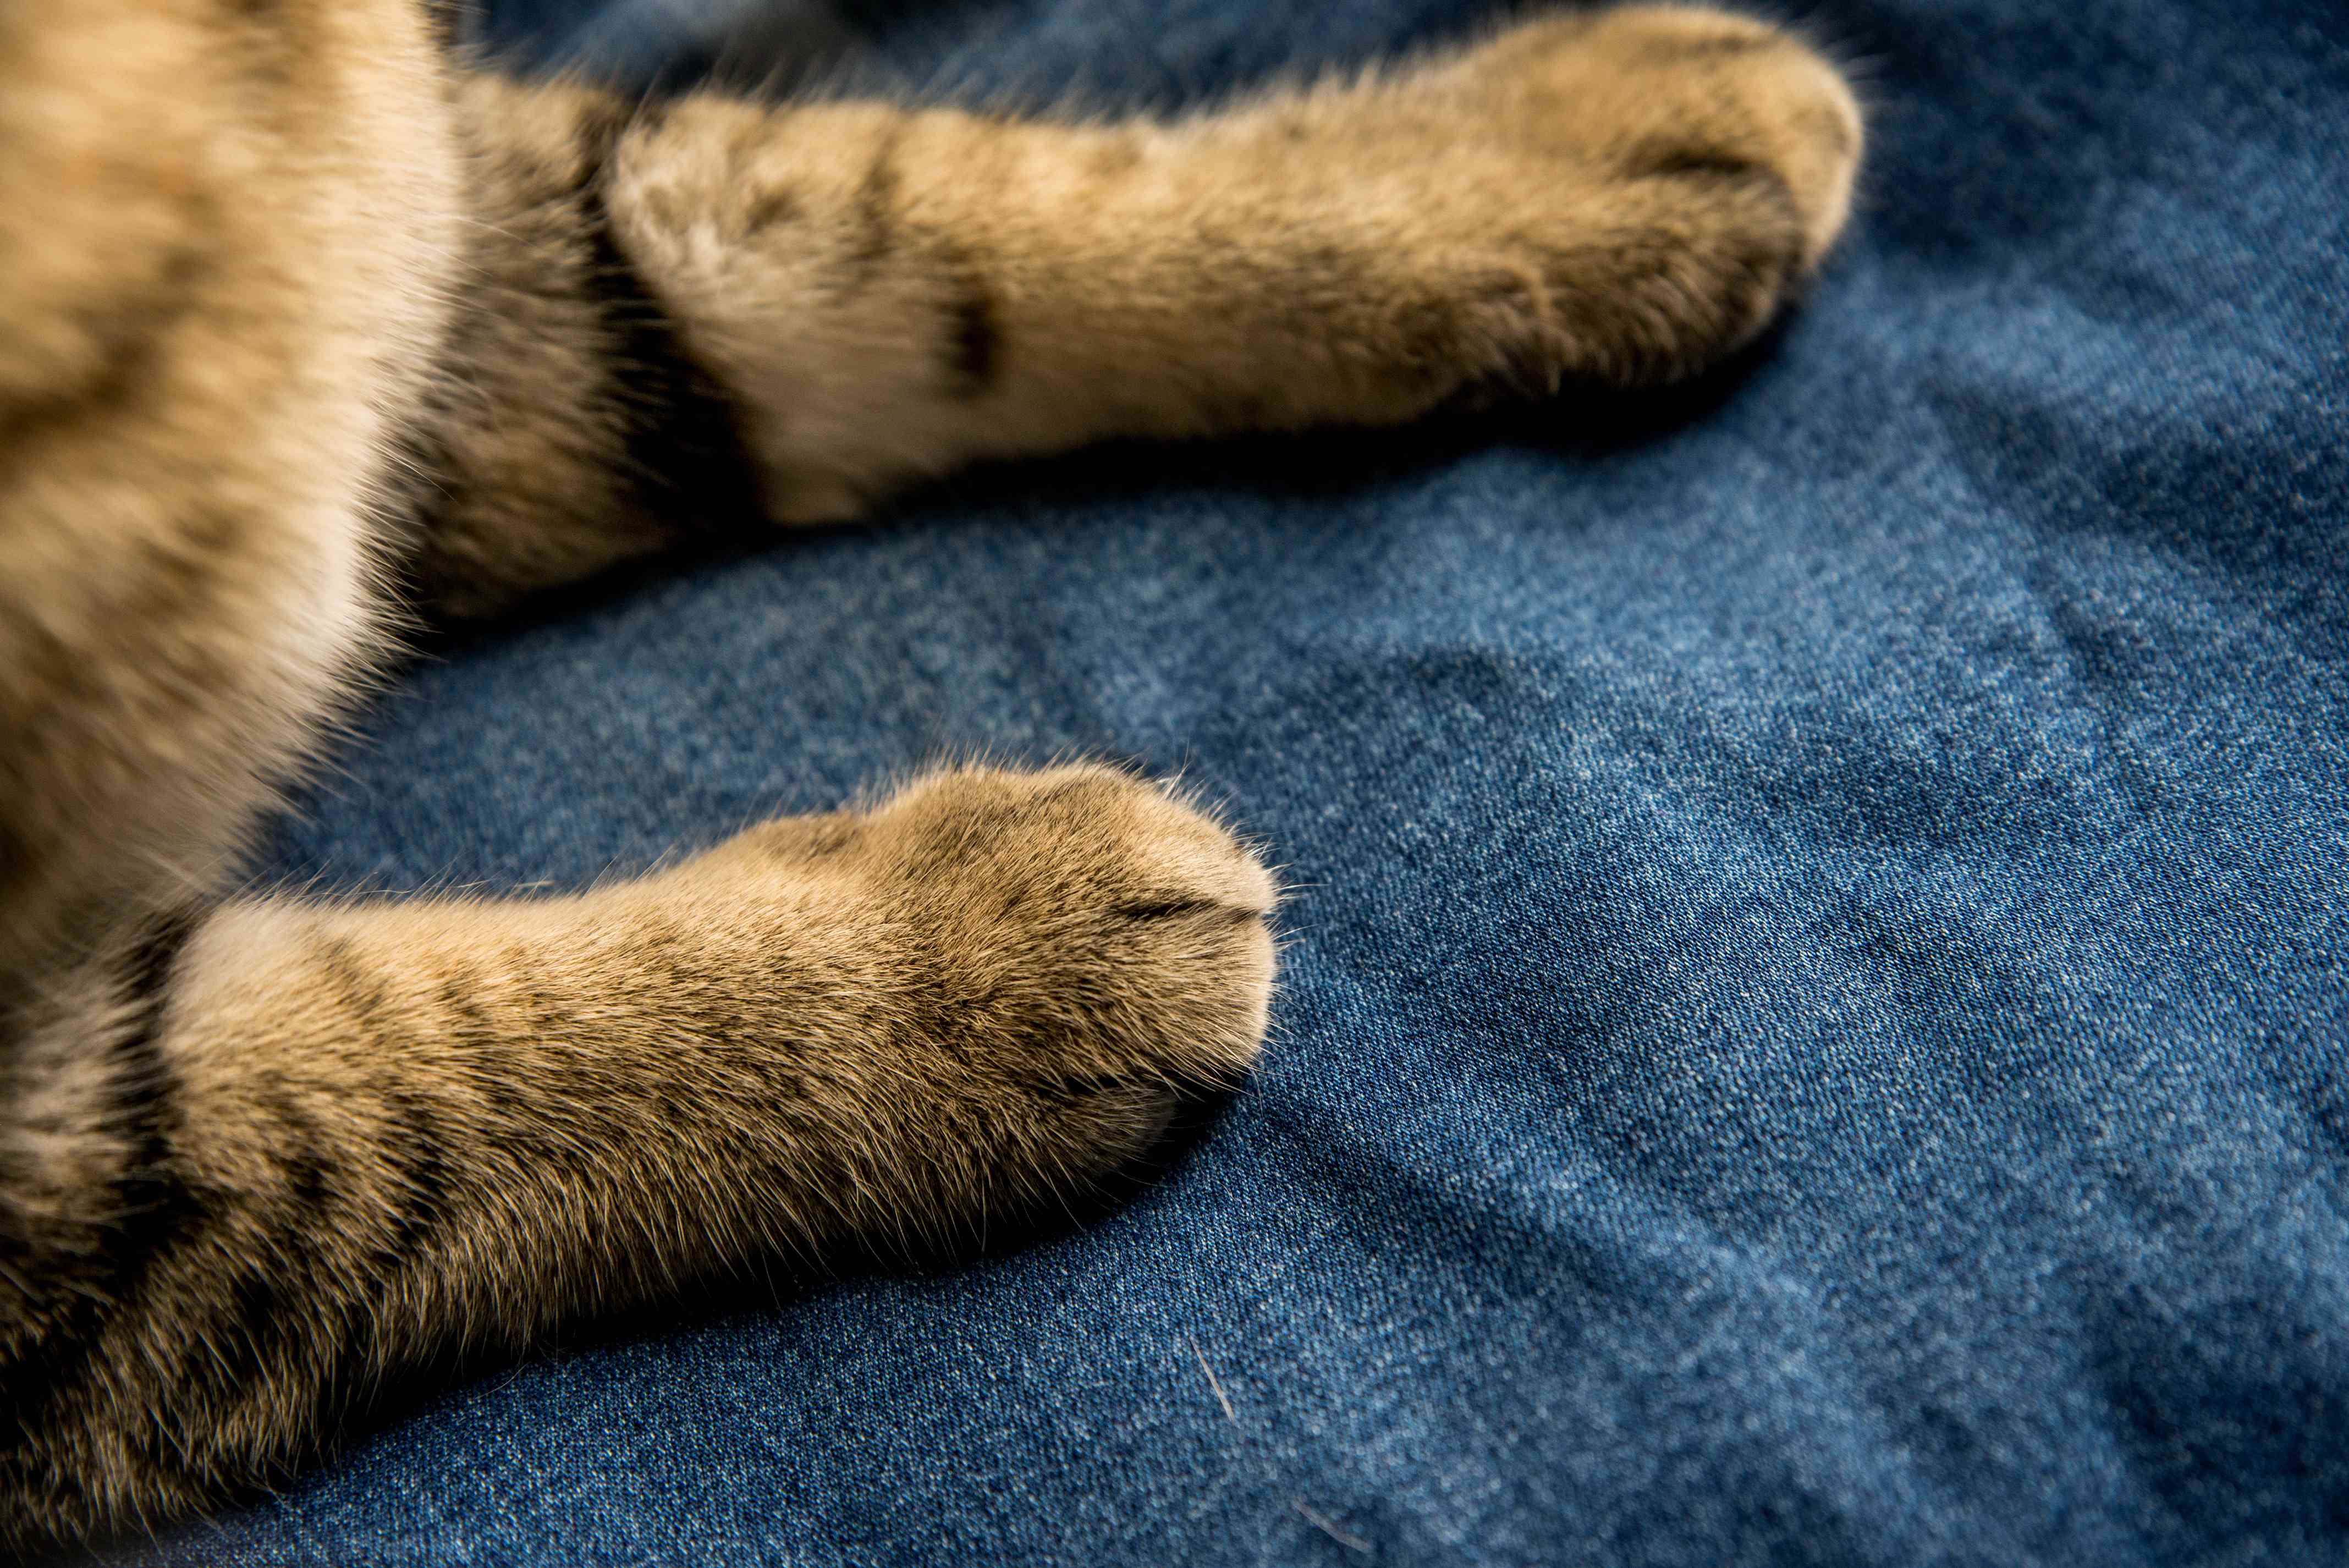 kitty's paws on denim fabric